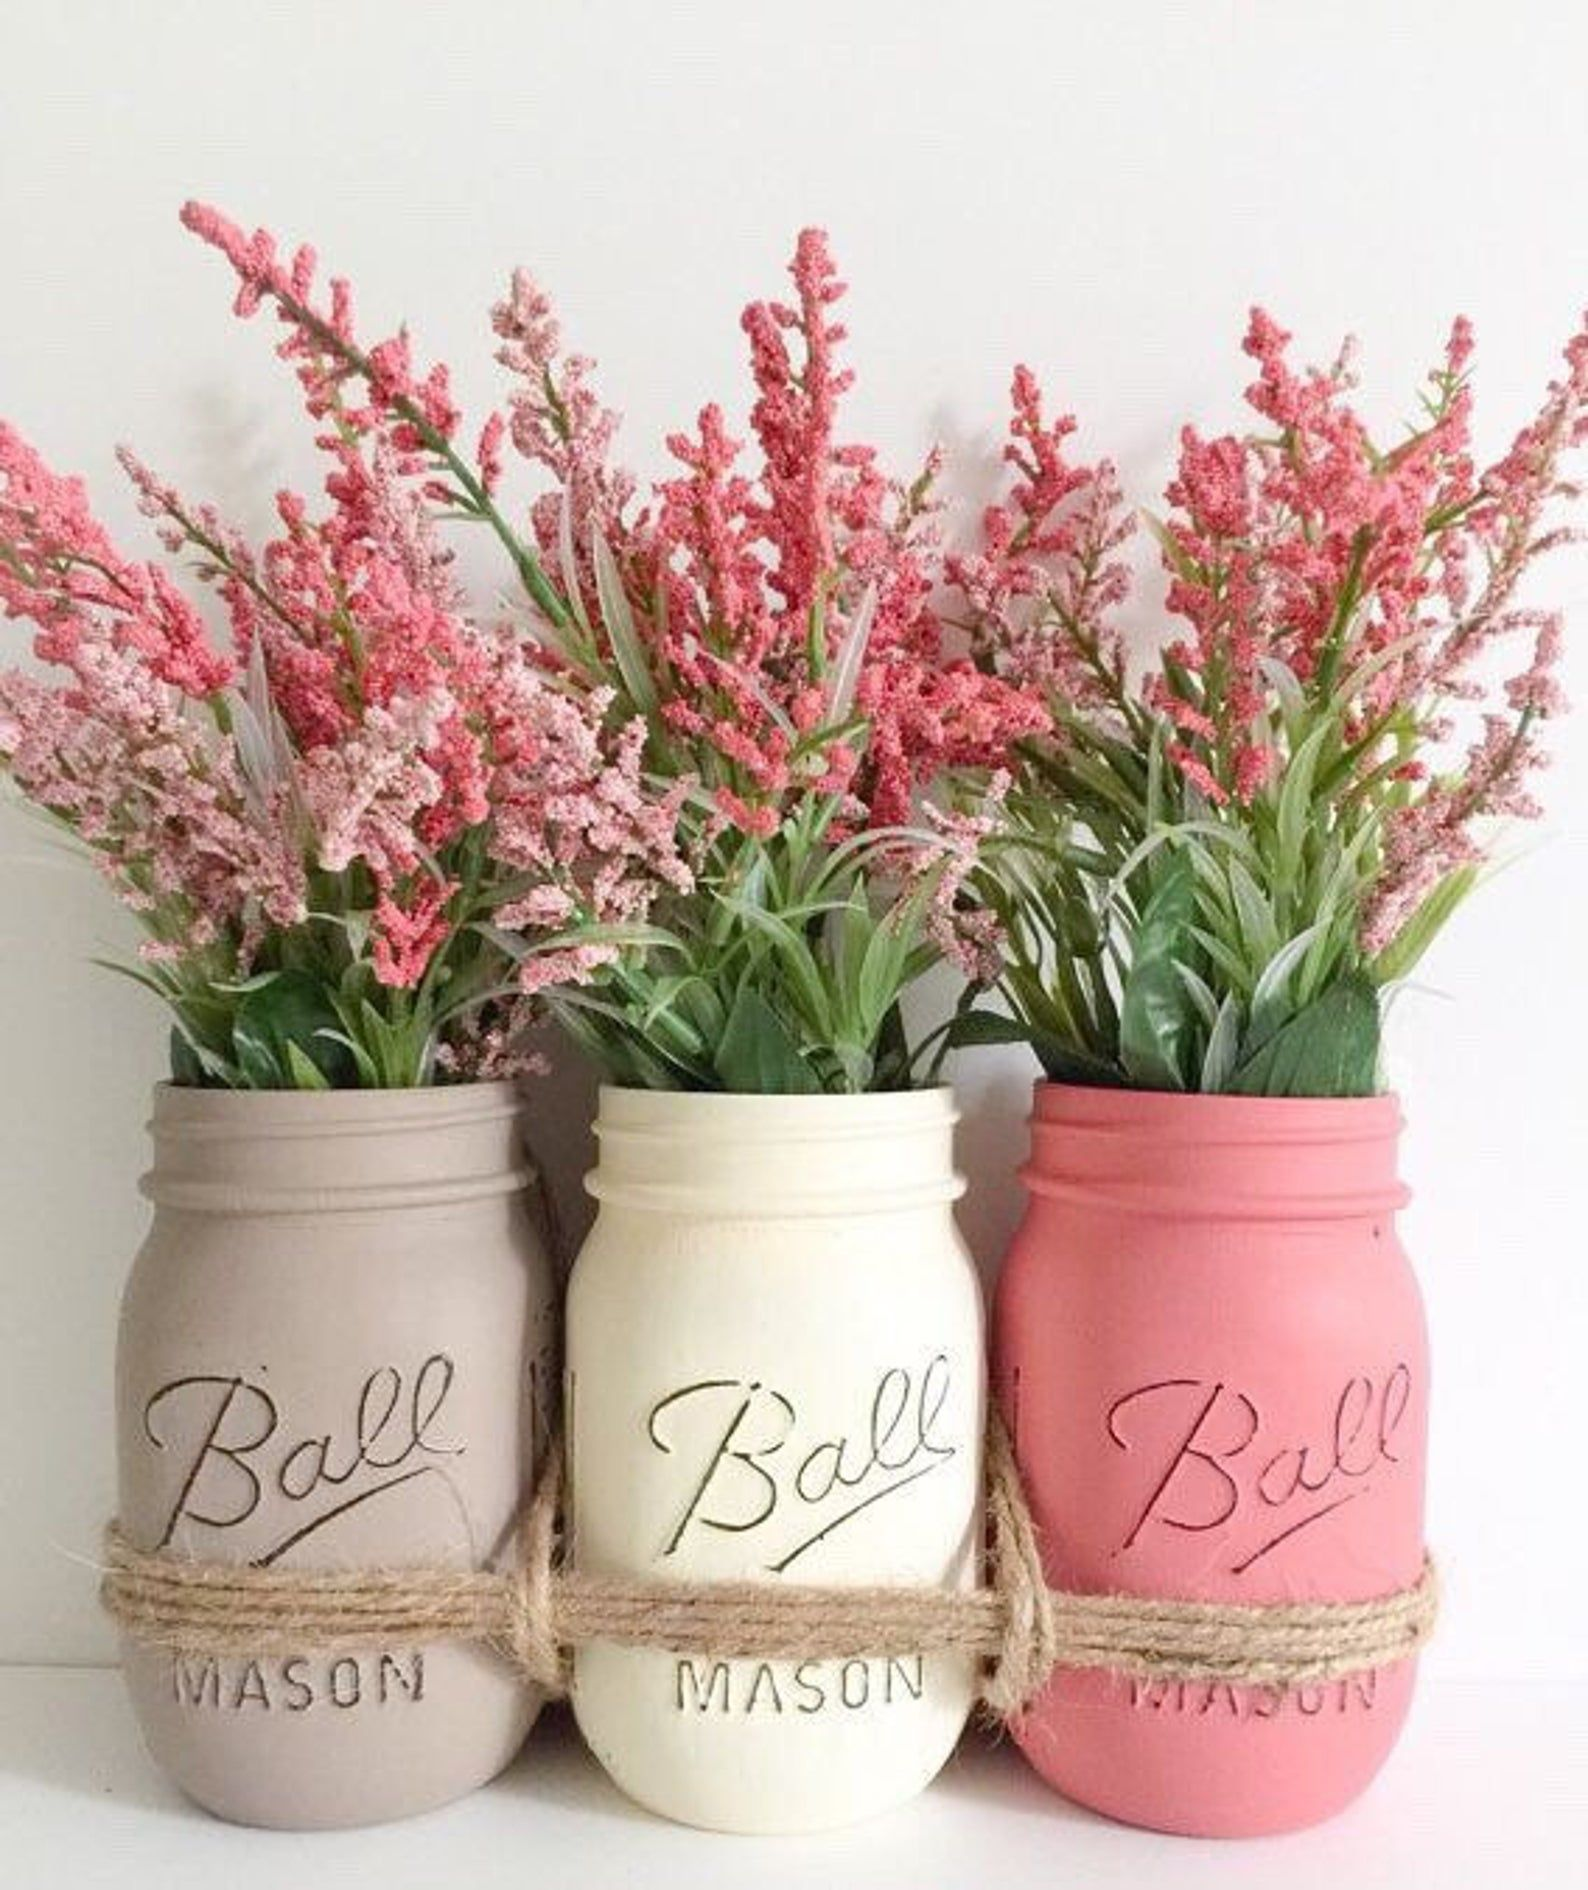 Mason Jars Centerpiece. Mothers Day Gift. Distressed Mason Jars. Wedding Centerpiece. Farmhouse Decor. Hand painted Mason Jars.